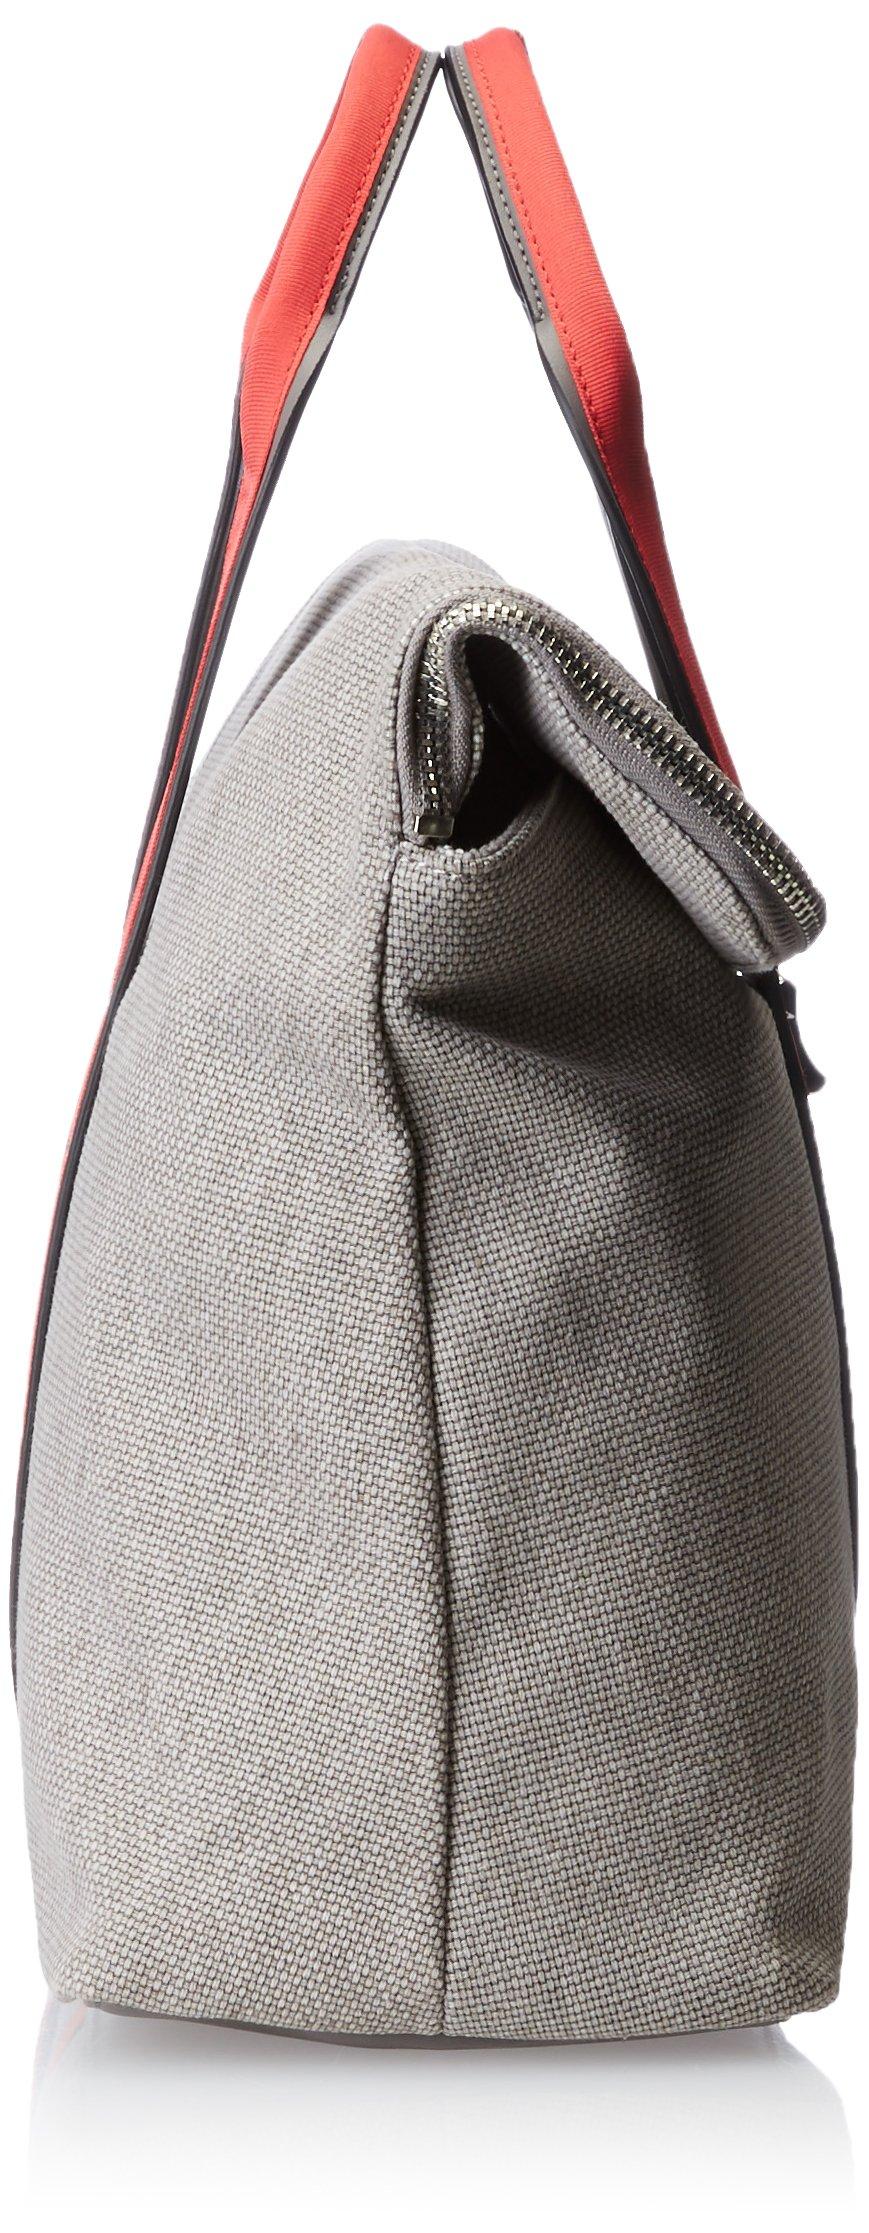 Splendid Cape May Satchel Top Handle Bag, Grey, One Size by Splendid (Image #3)